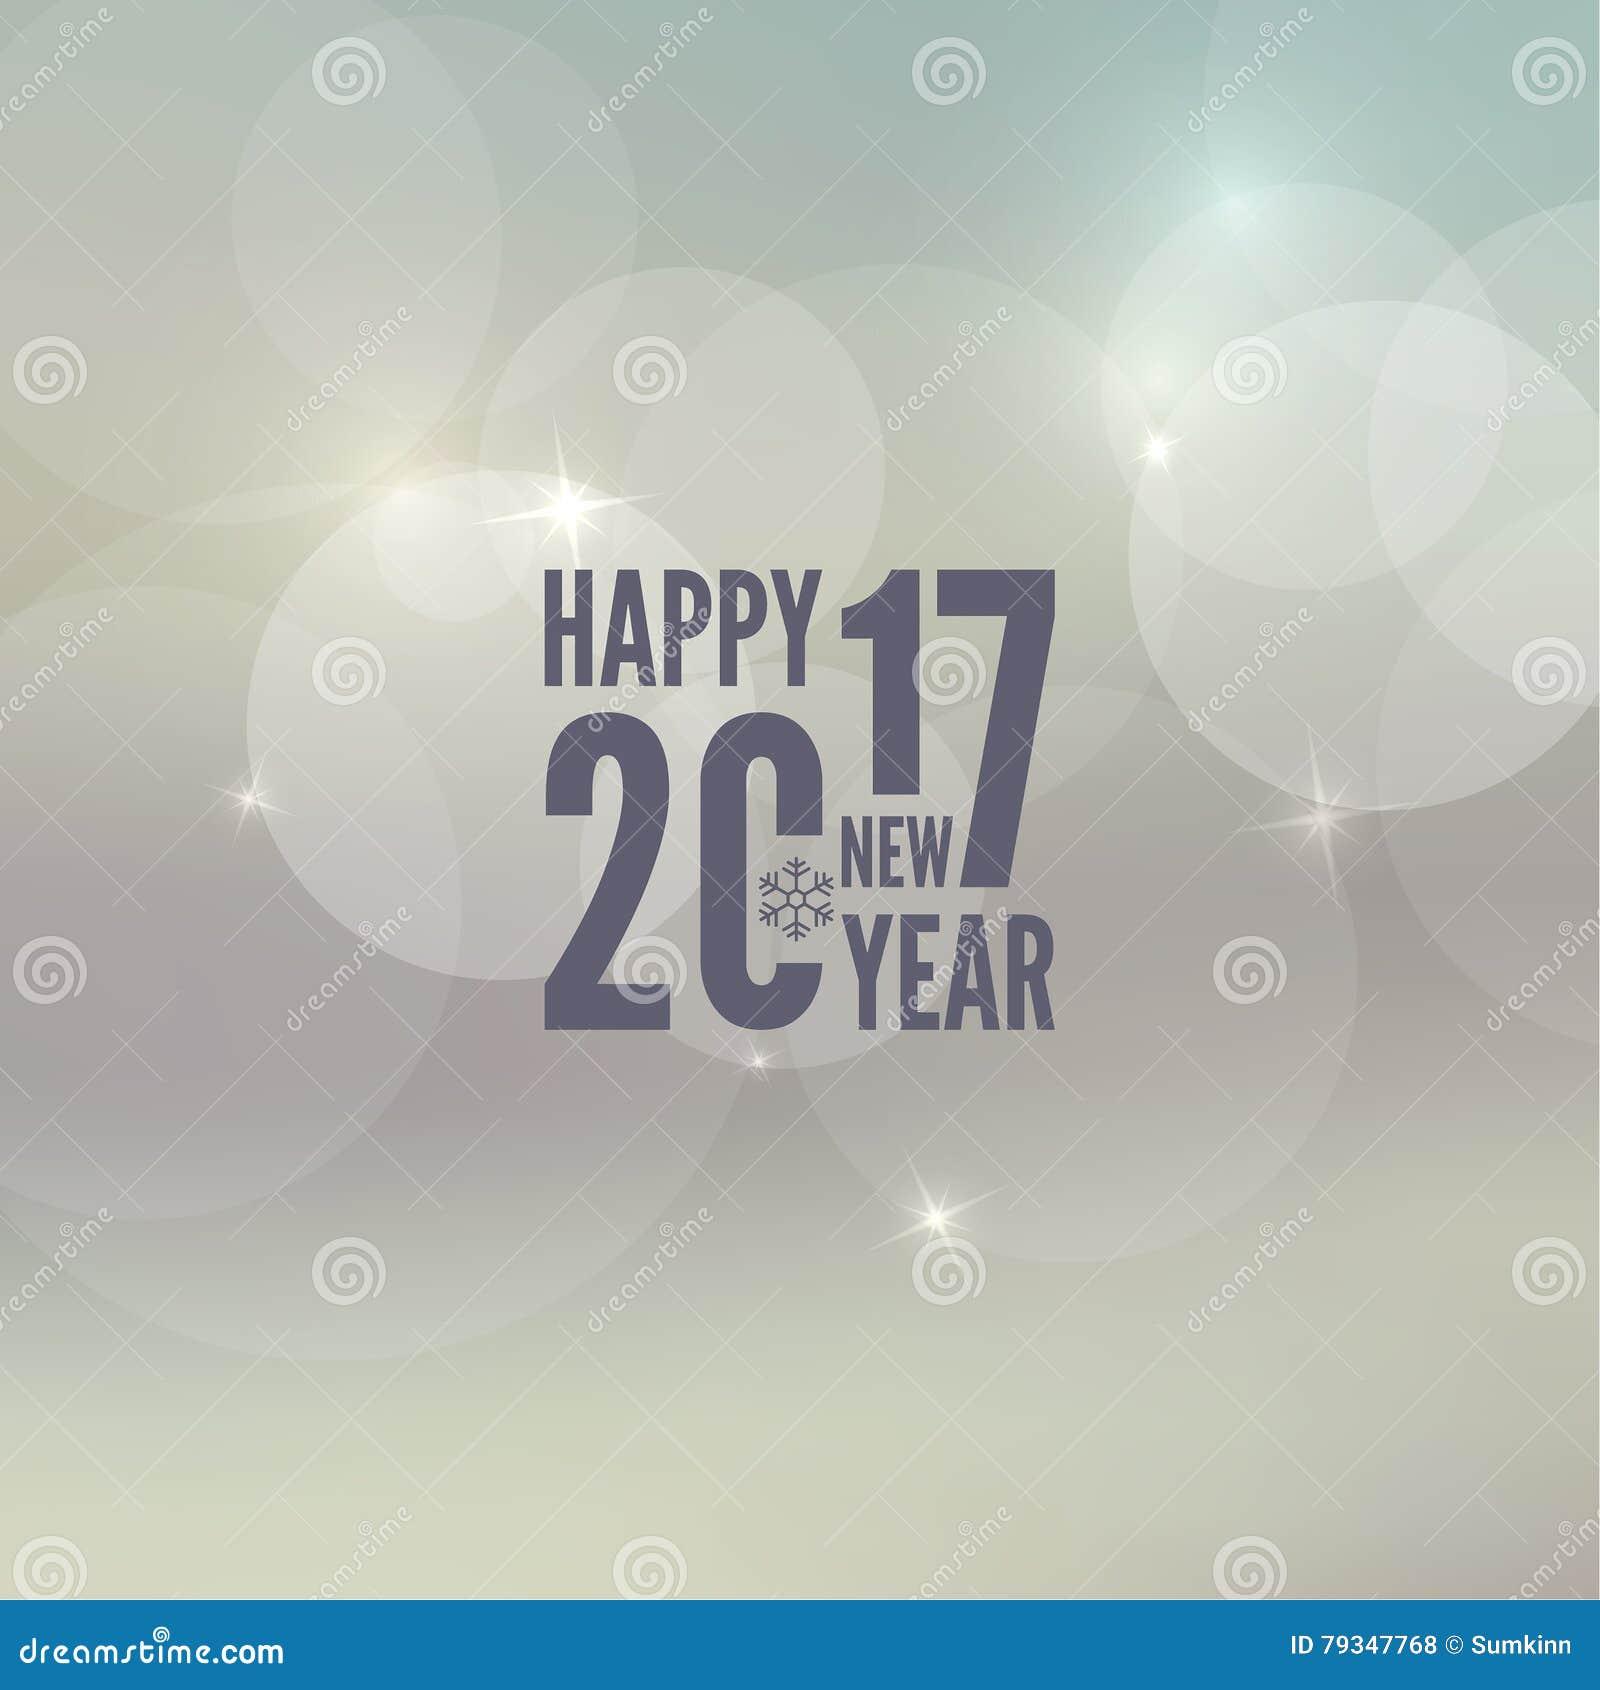 Happy New Year 2017 Theme. Stock Vector - Image: 79347768